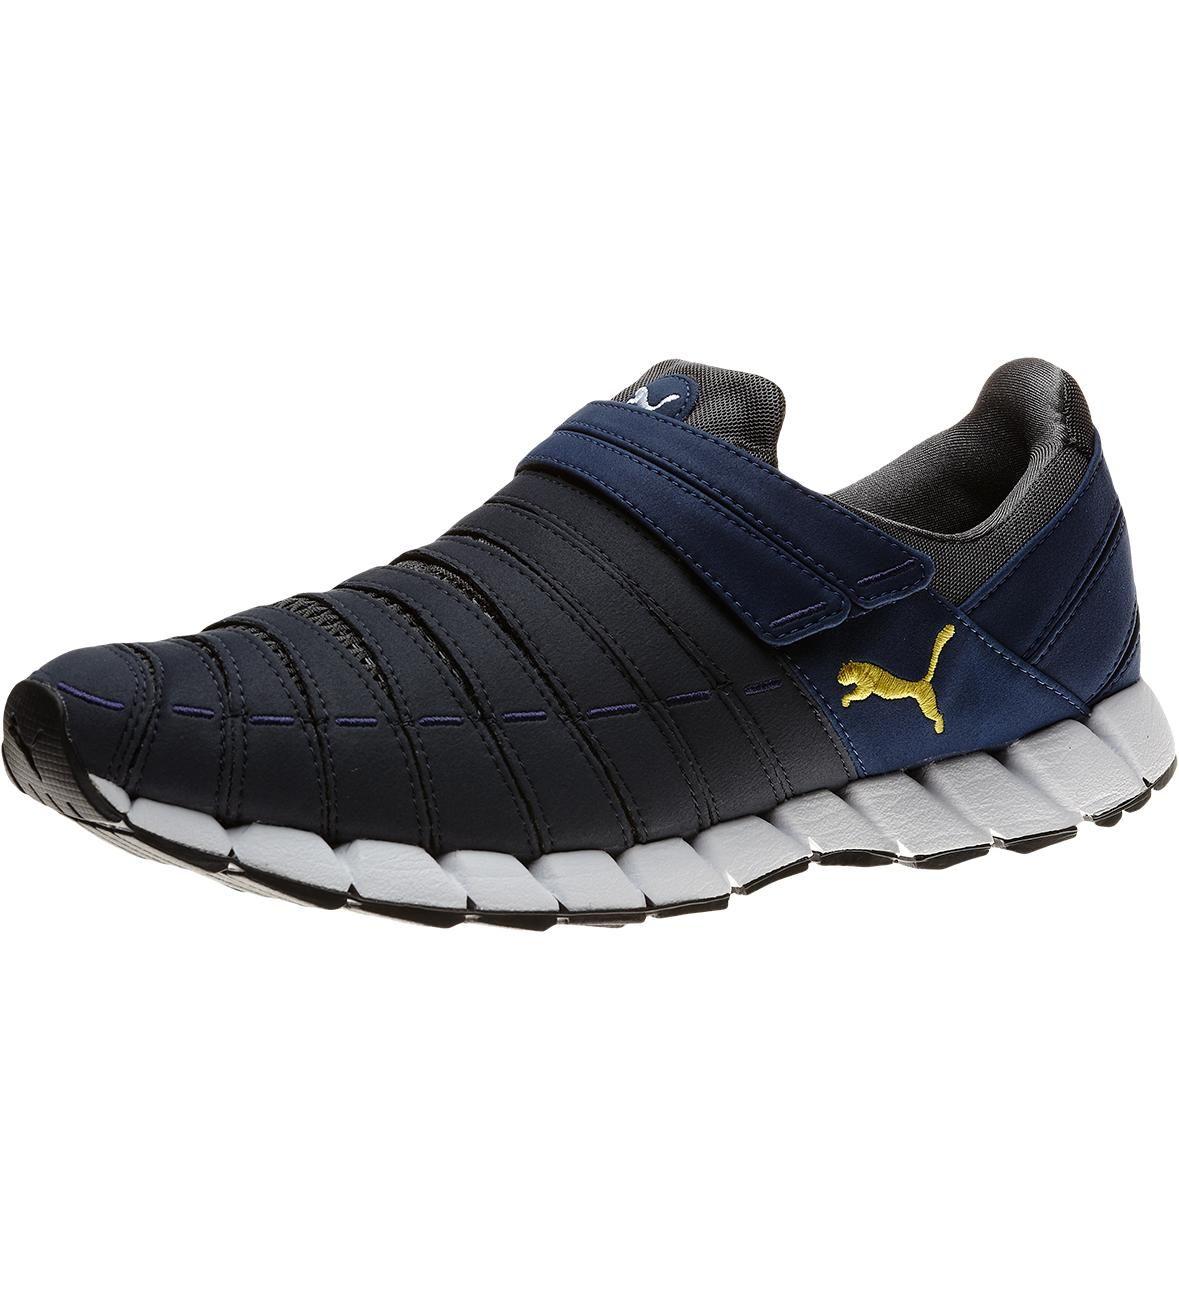 puma osu nw running shoe   PUMA Osu NM Running Shoes